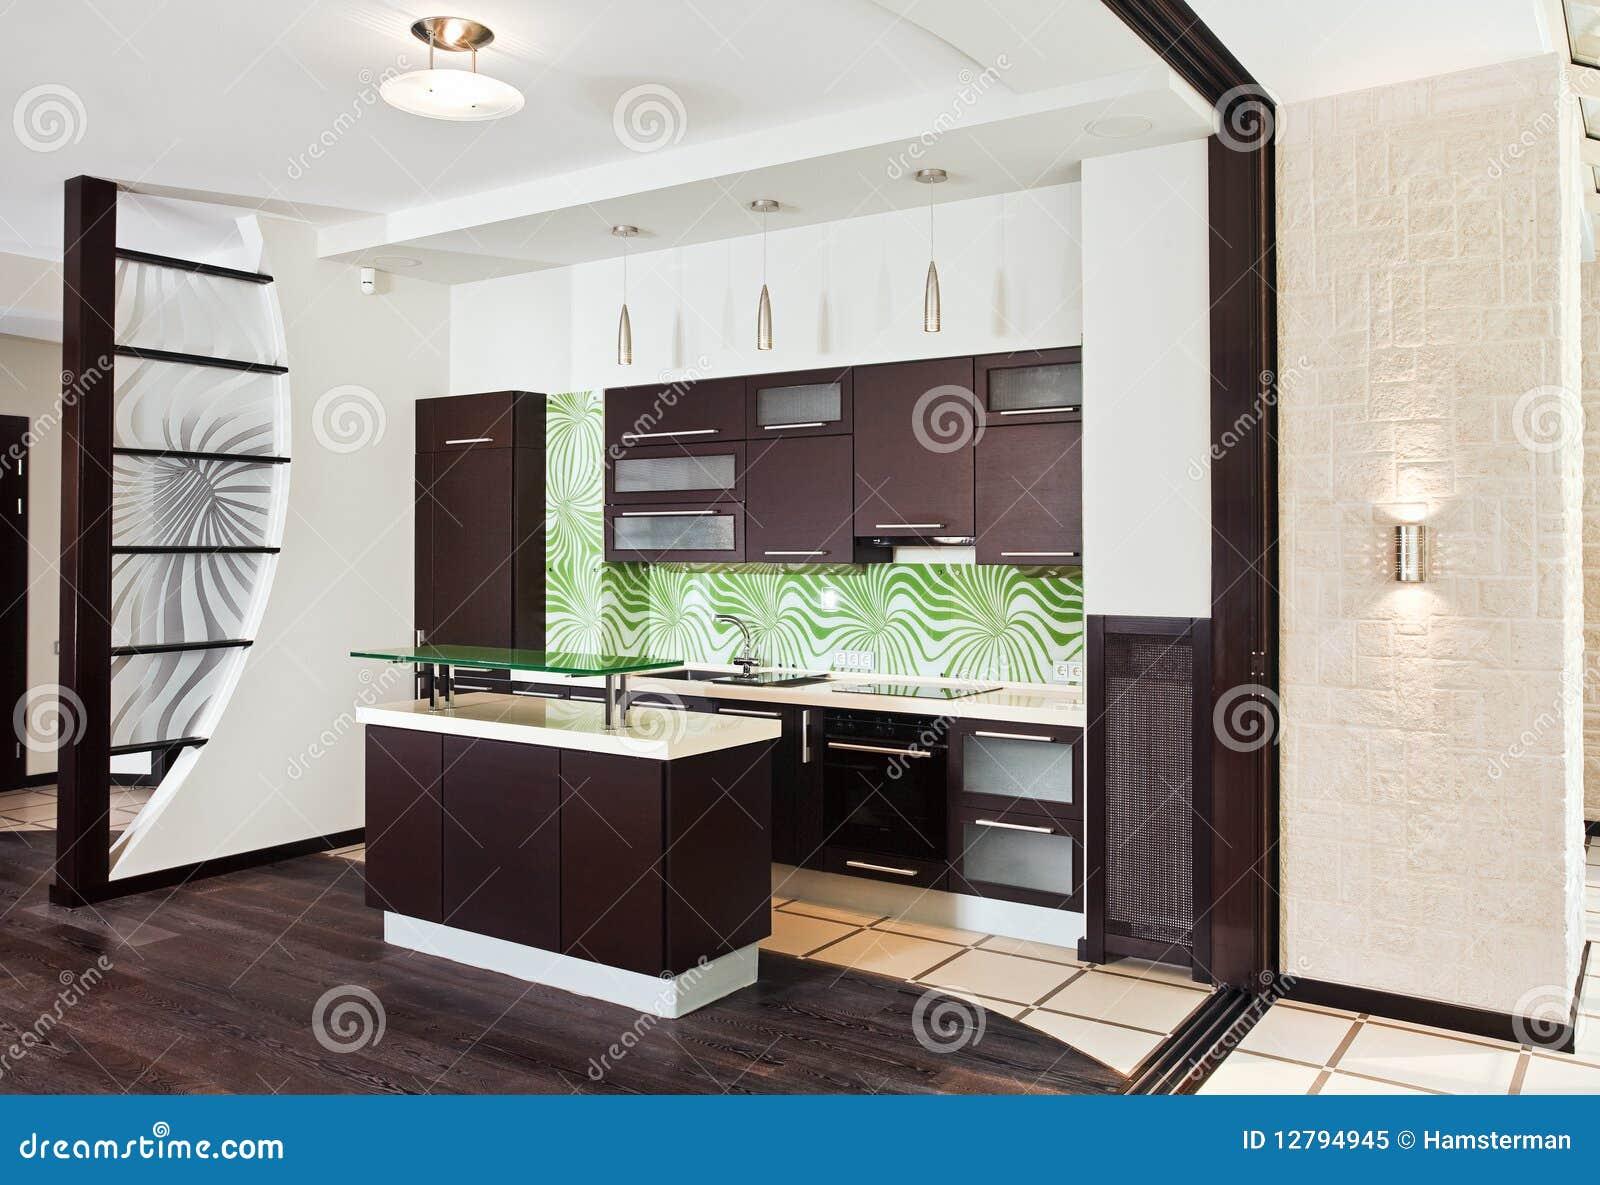 Moderne keuken met donkere houten vloer royalty vrije stock foto afbeelding 12794945 - Moderne keukenfotos ...